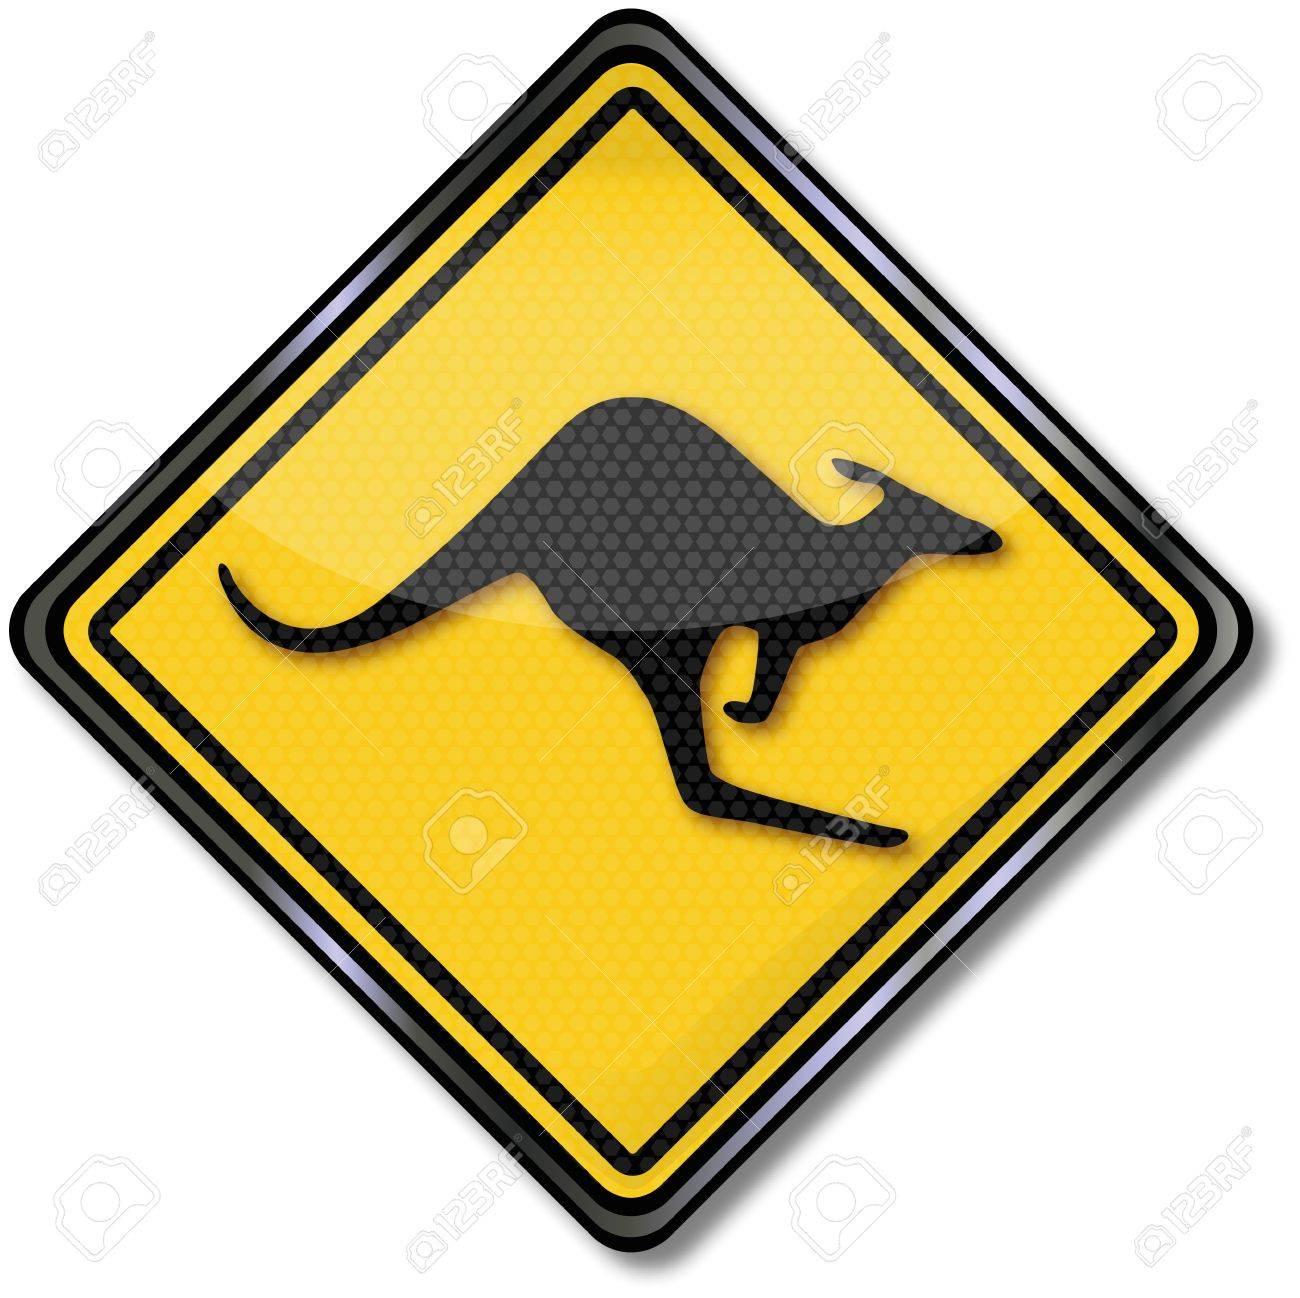 Kangaroo traffic sign Stock Vector - 14777977